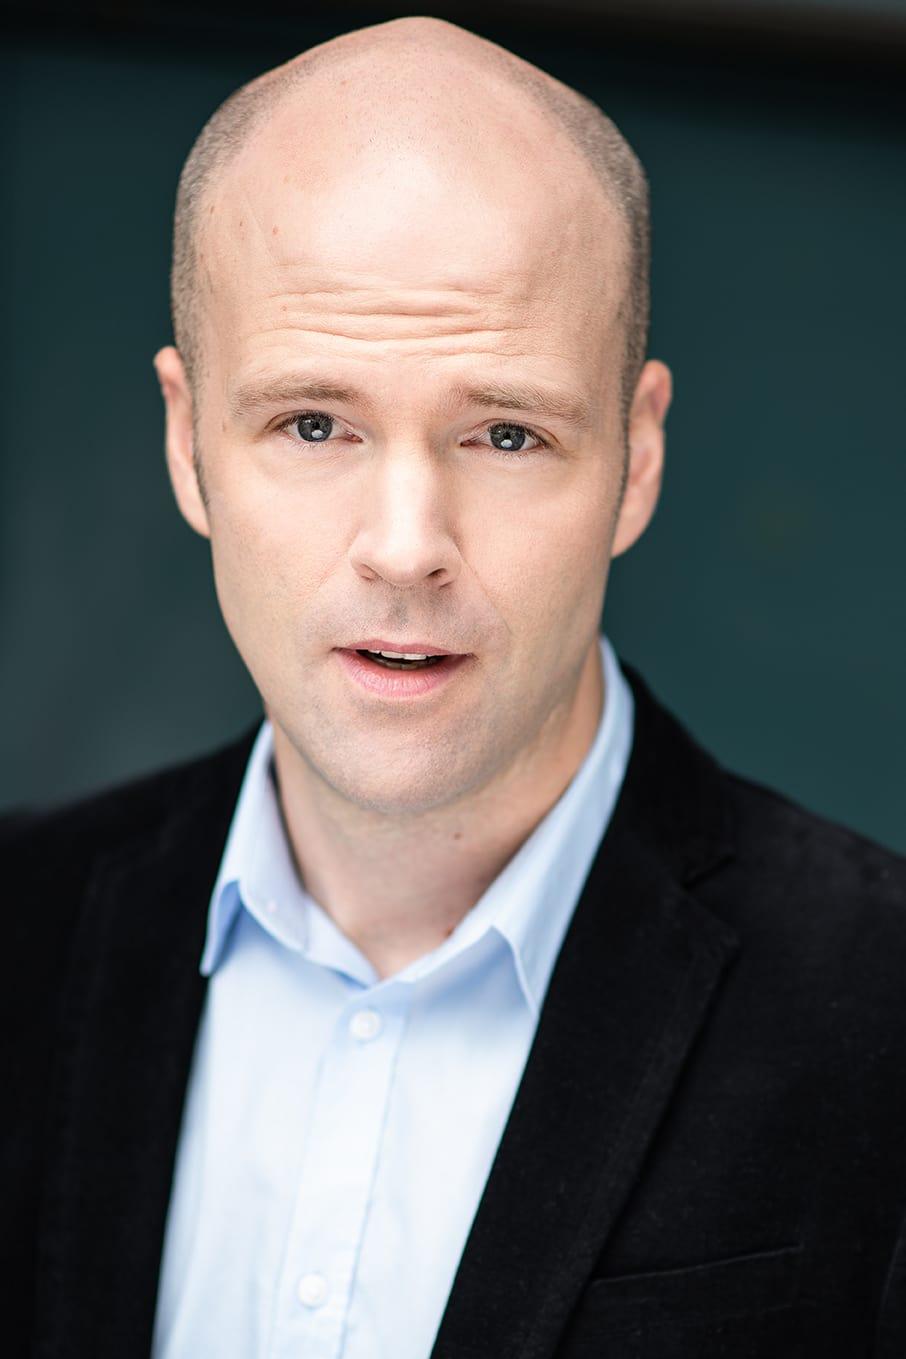 Joel Stephanson